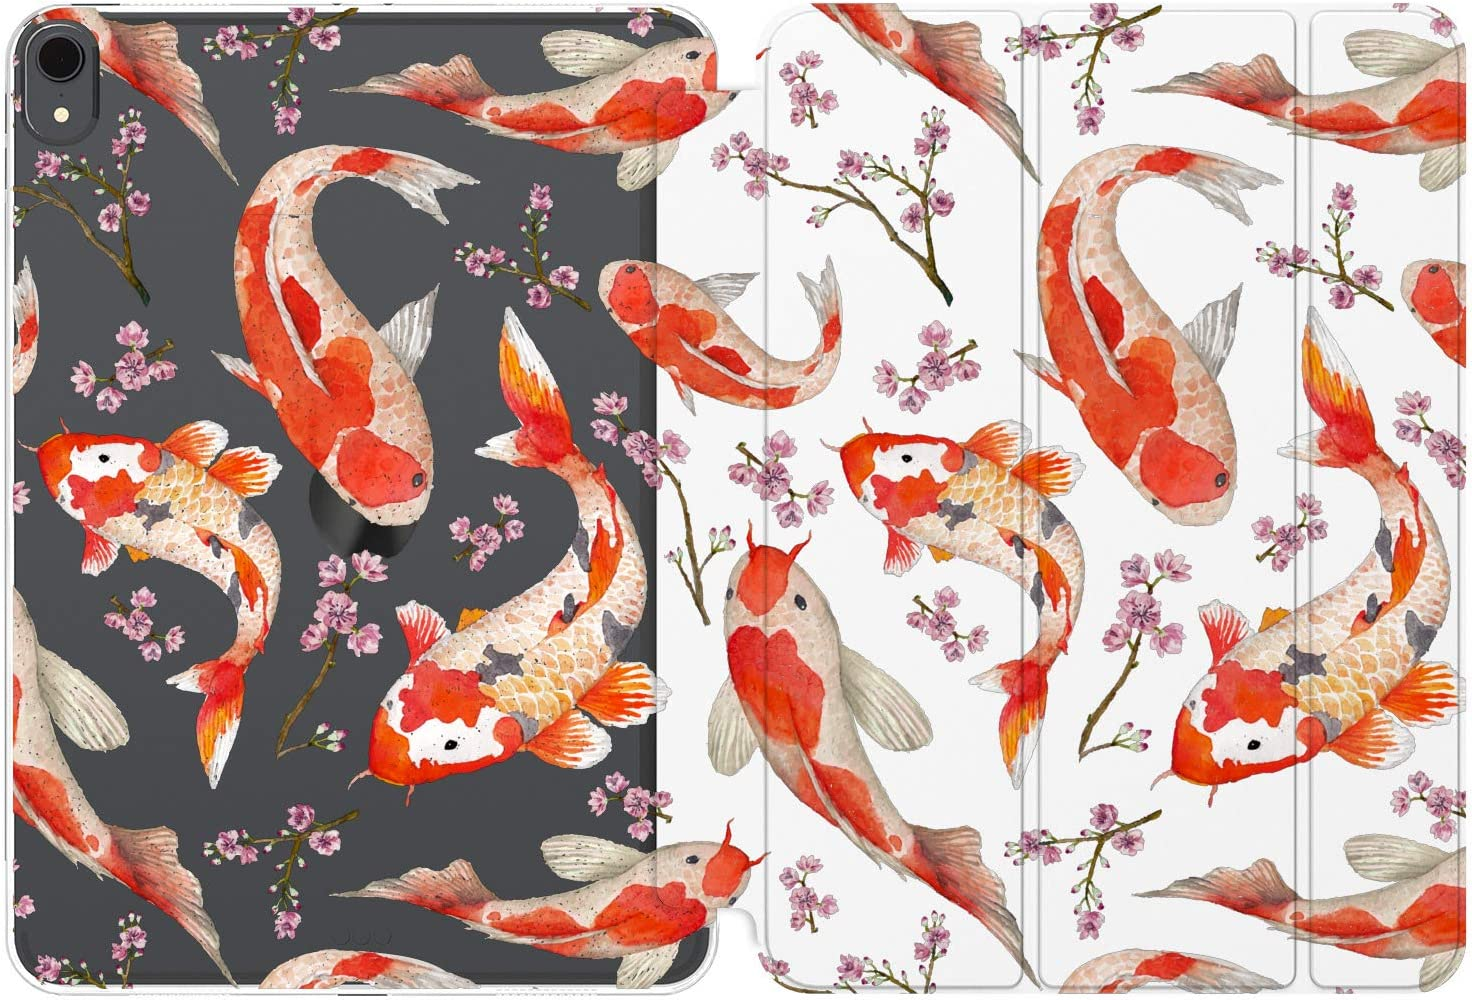 Cavka Case for Apple iPad 10.2 8th Gen 12.9 Pro 11 10.5 9.7 Air 3 Mini 5 4 3 2 1 2019/18 Women Red Girly Magnetic Closure Pond Pattern Sakura Smart Cover Koi Fish Animal Japanese Kawaii